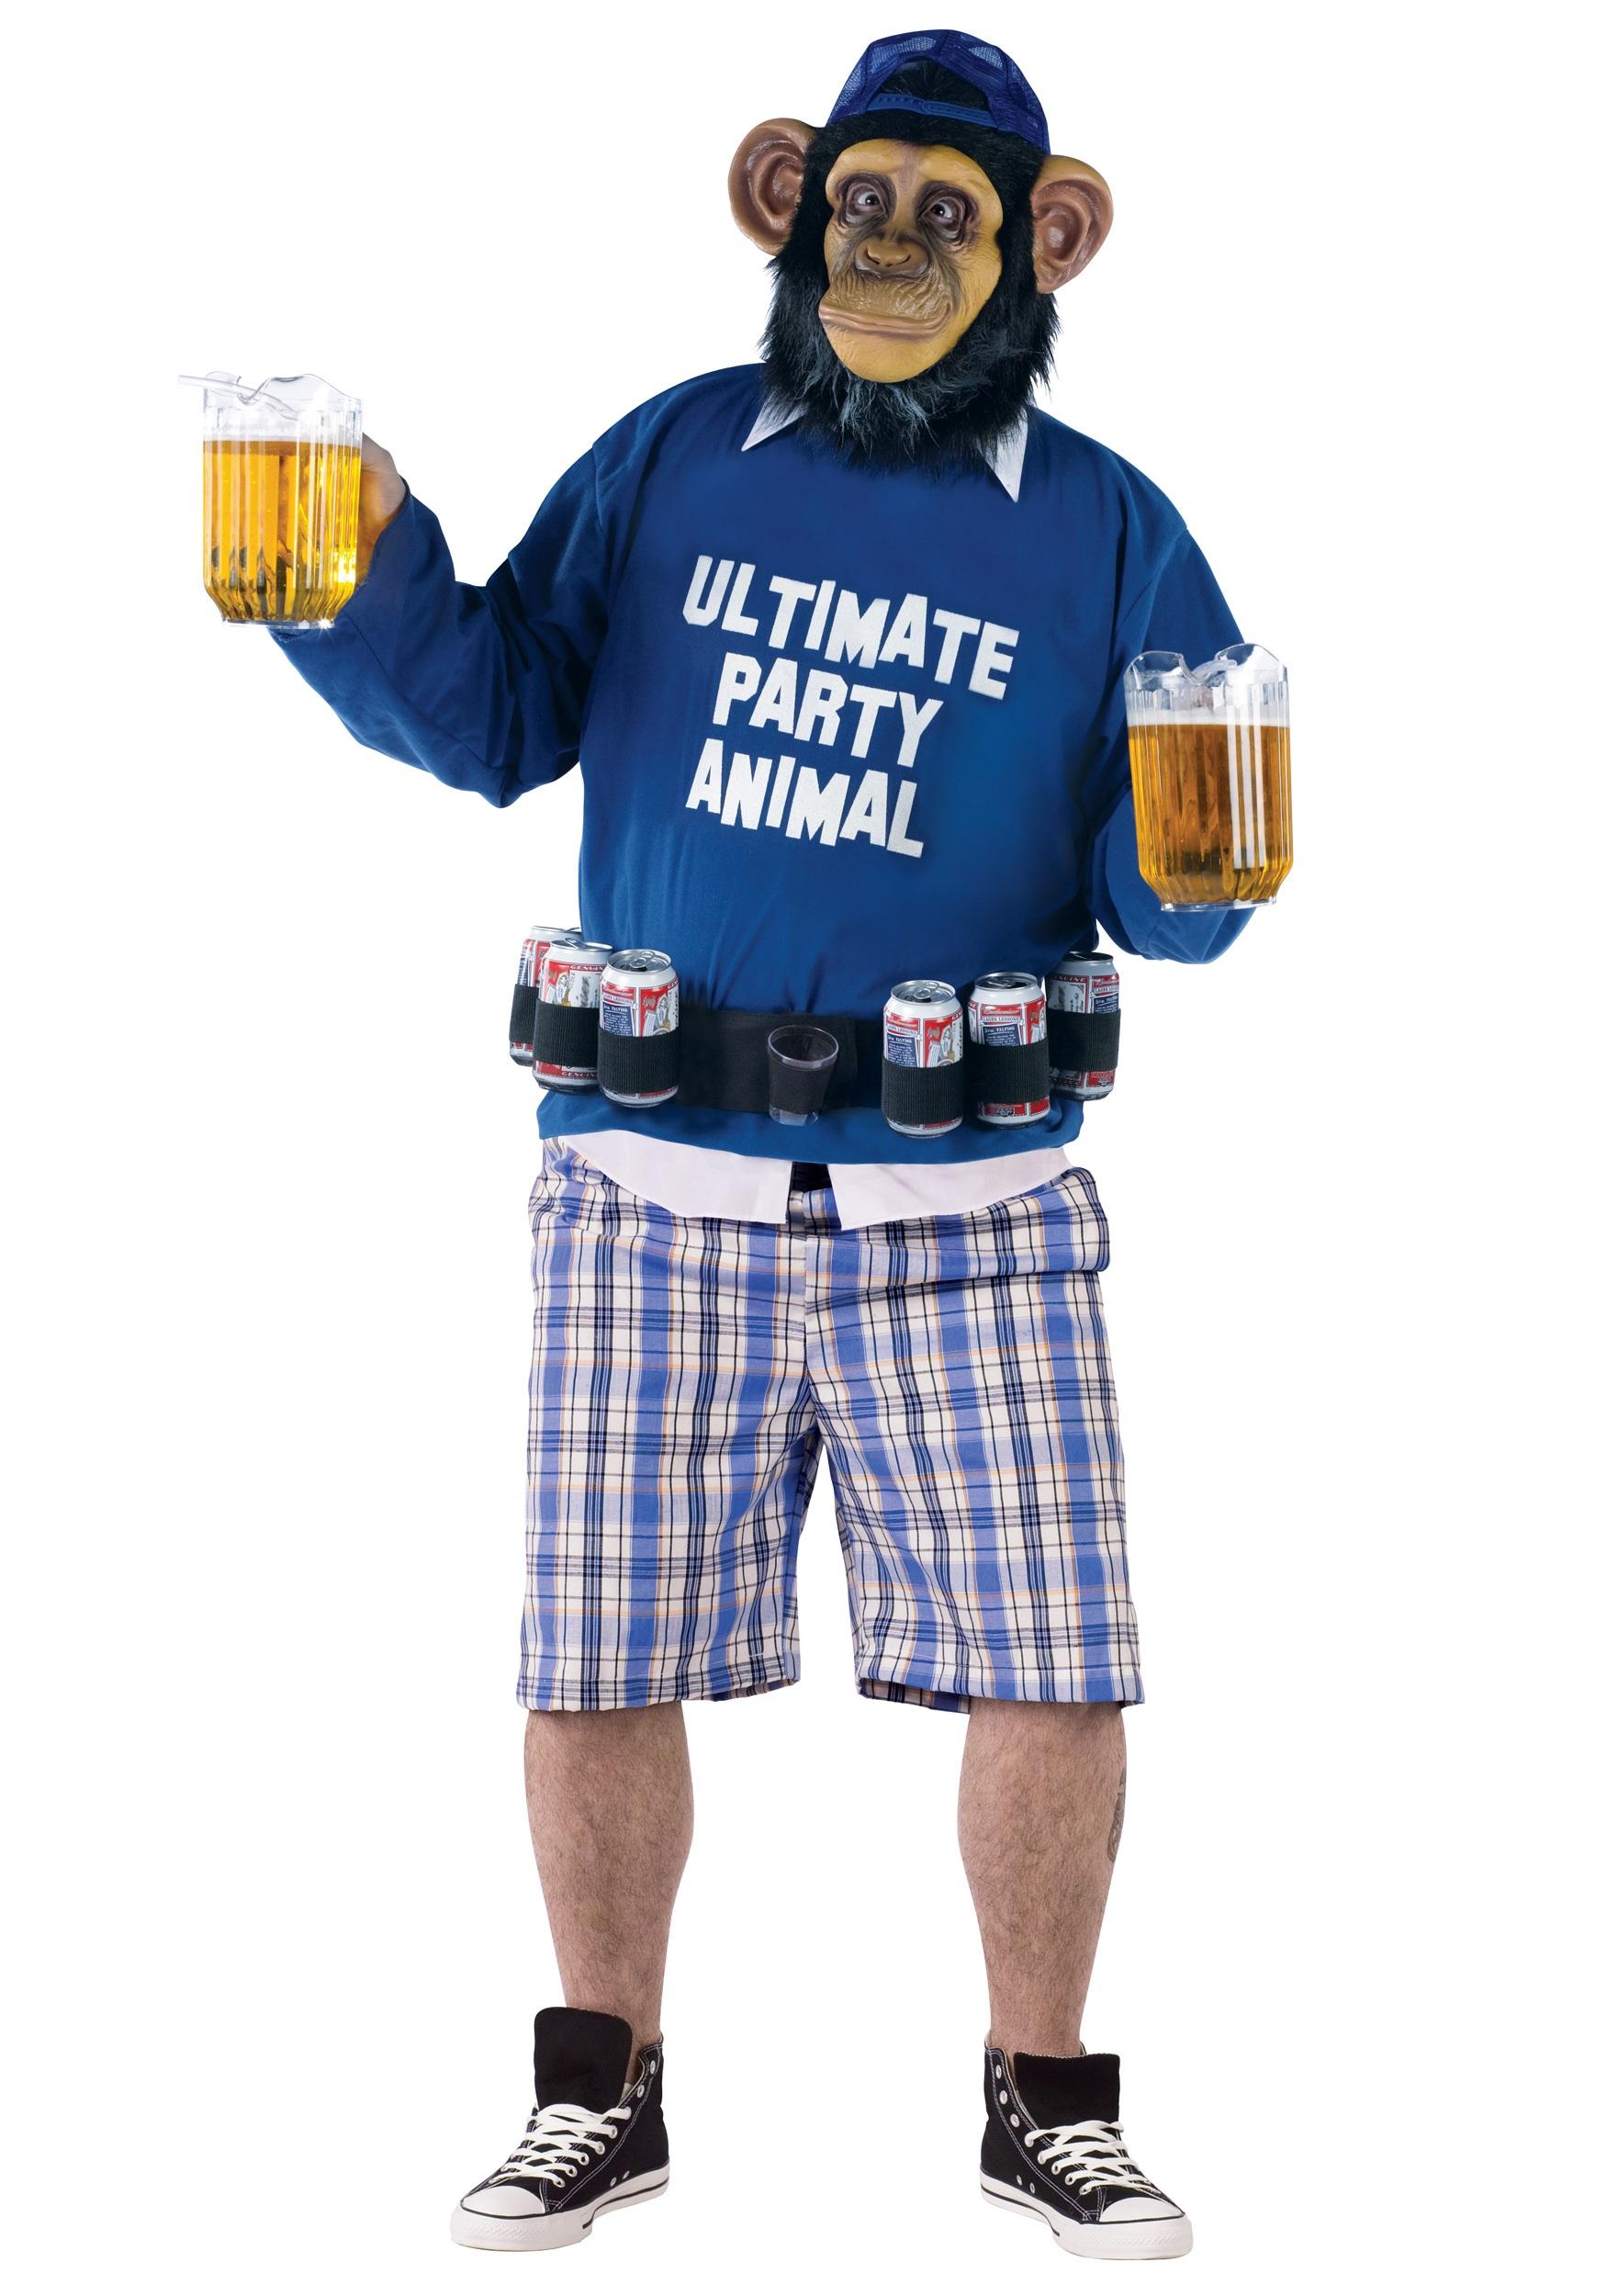 Plus Party Animal Costume  sc 1 st  Halloween Costumes & Plus Party Animal Costume - Halloween Costumes